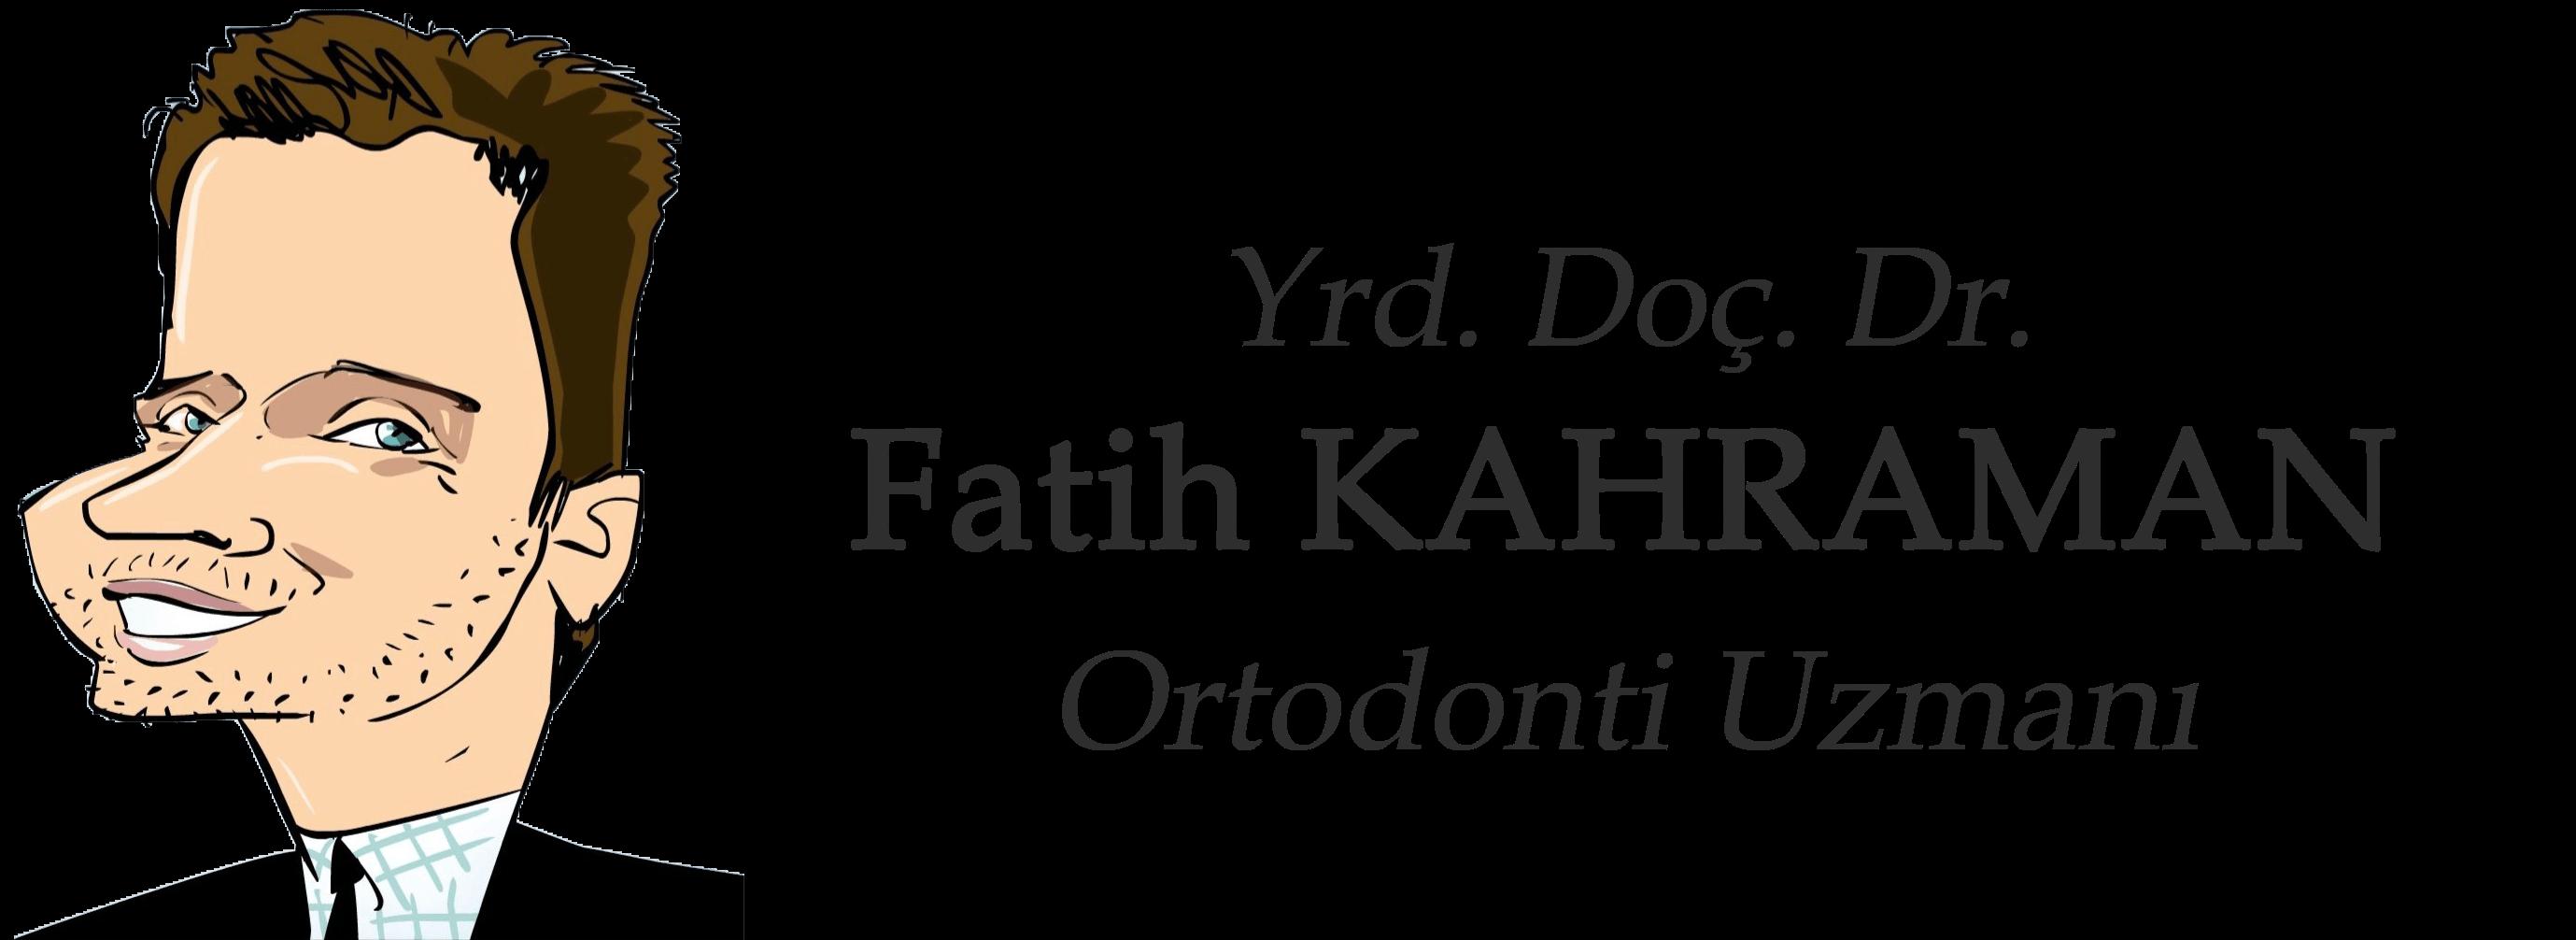 Fatih Kahraman – Yrd. Doç. Dr. Ortodontist